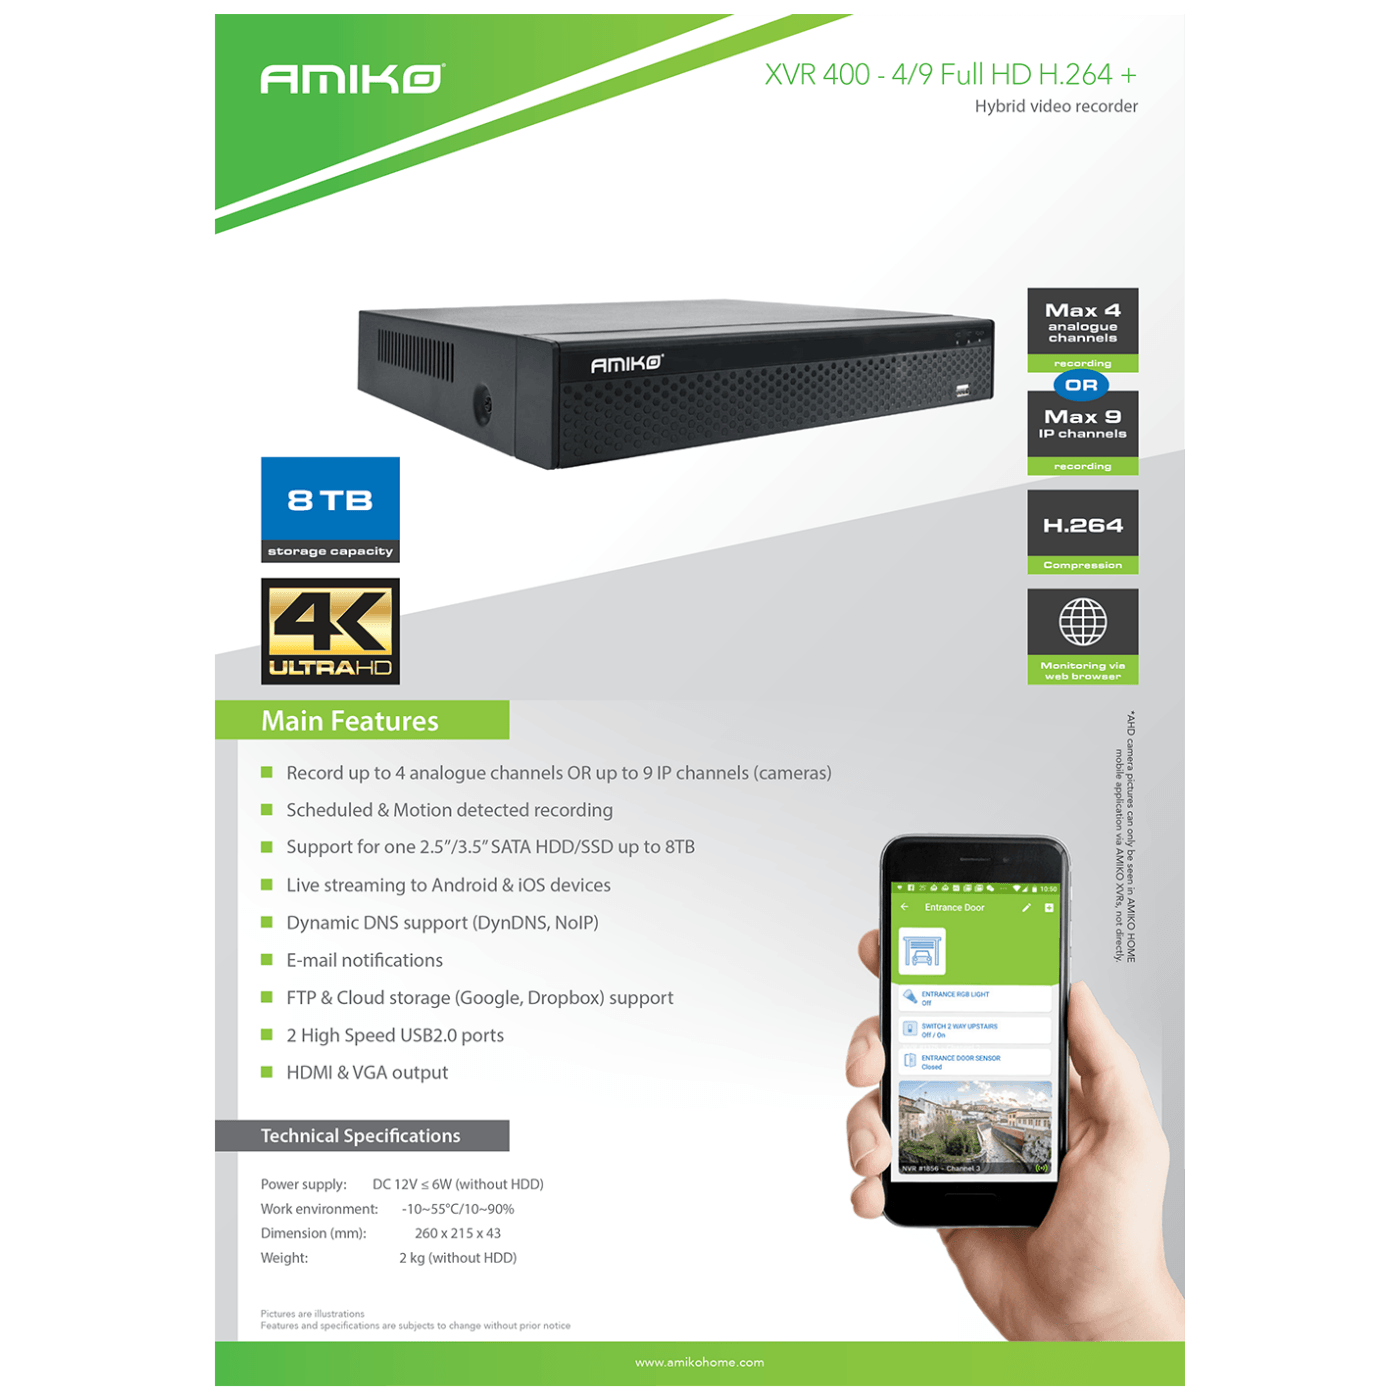 XVR 400 - 4/9 FULL HD H.264+